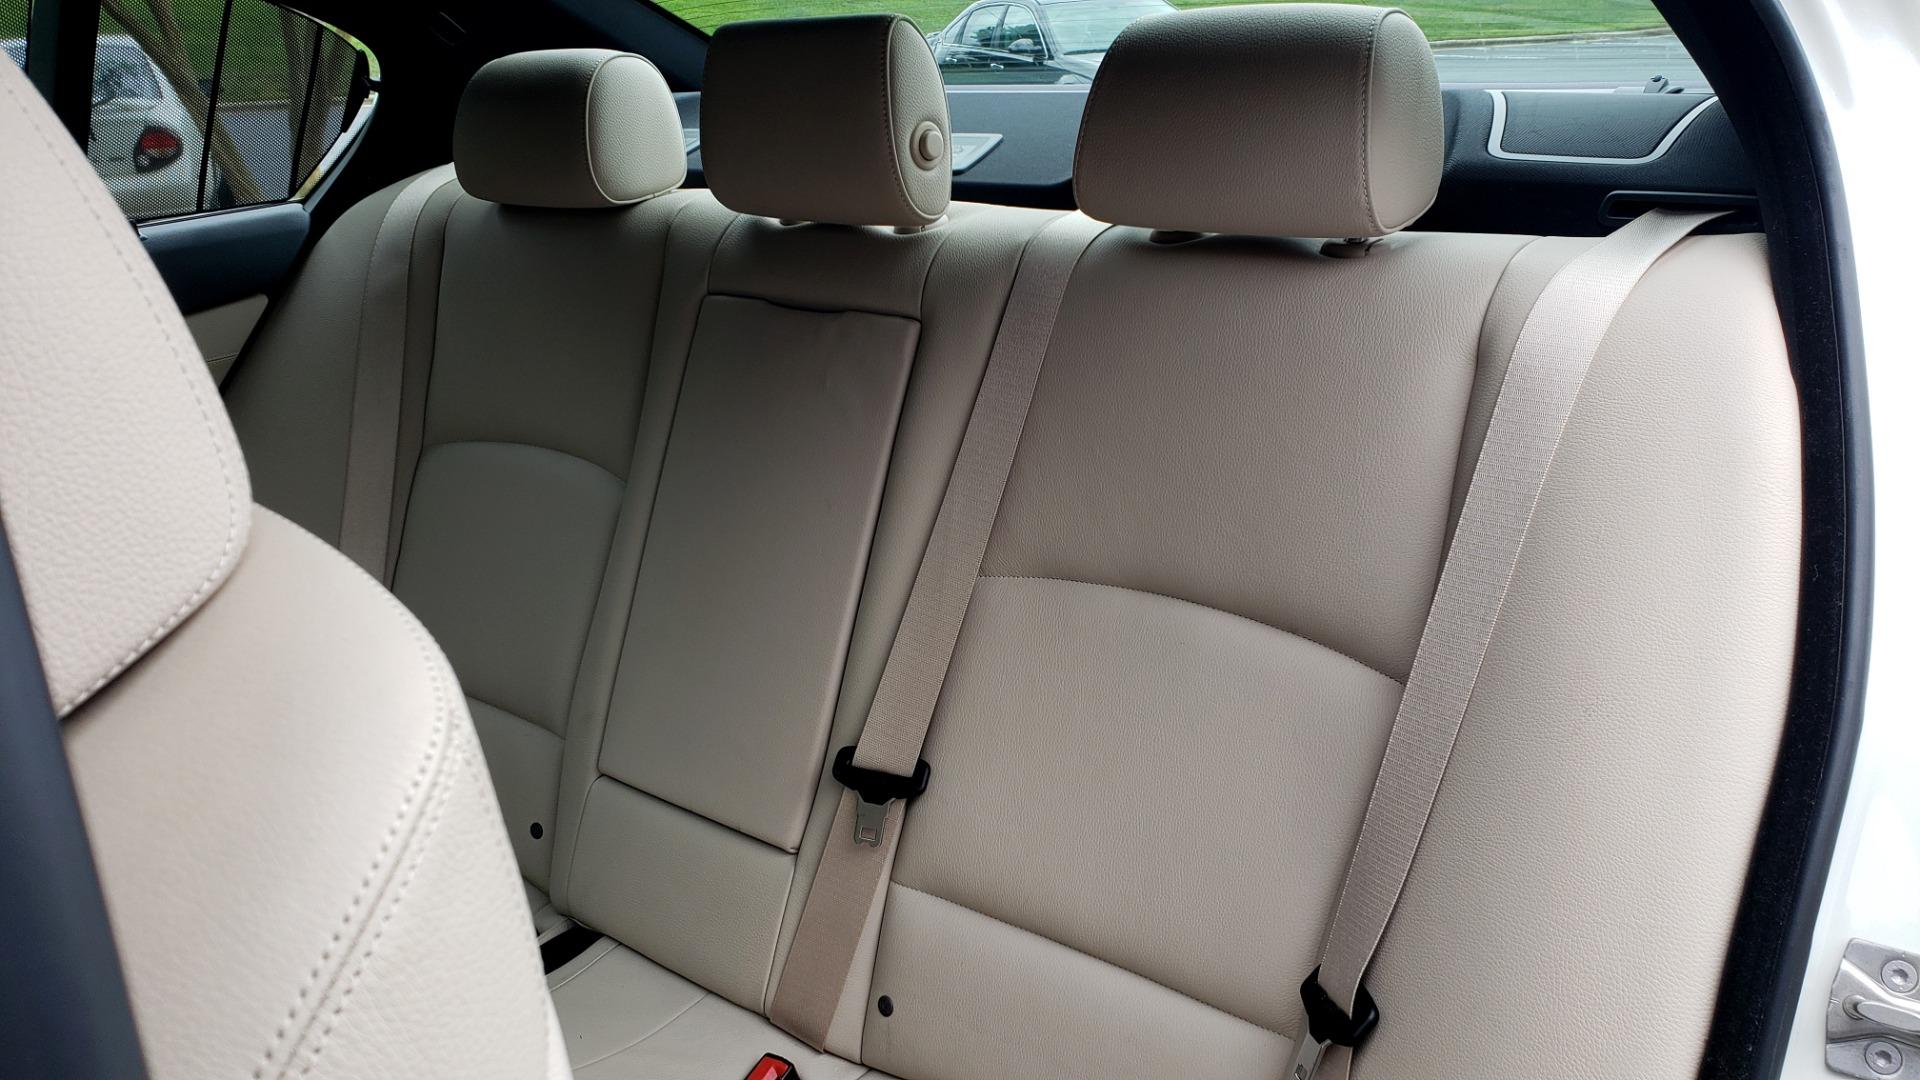 Used 2012 BMW 5 SERIES 550I M SPORT / NAV / CONV PKG / SUNROOF / PREM SND / REARVIEW for sale Sold at Formula Imports in Charlotte NC 28227 53